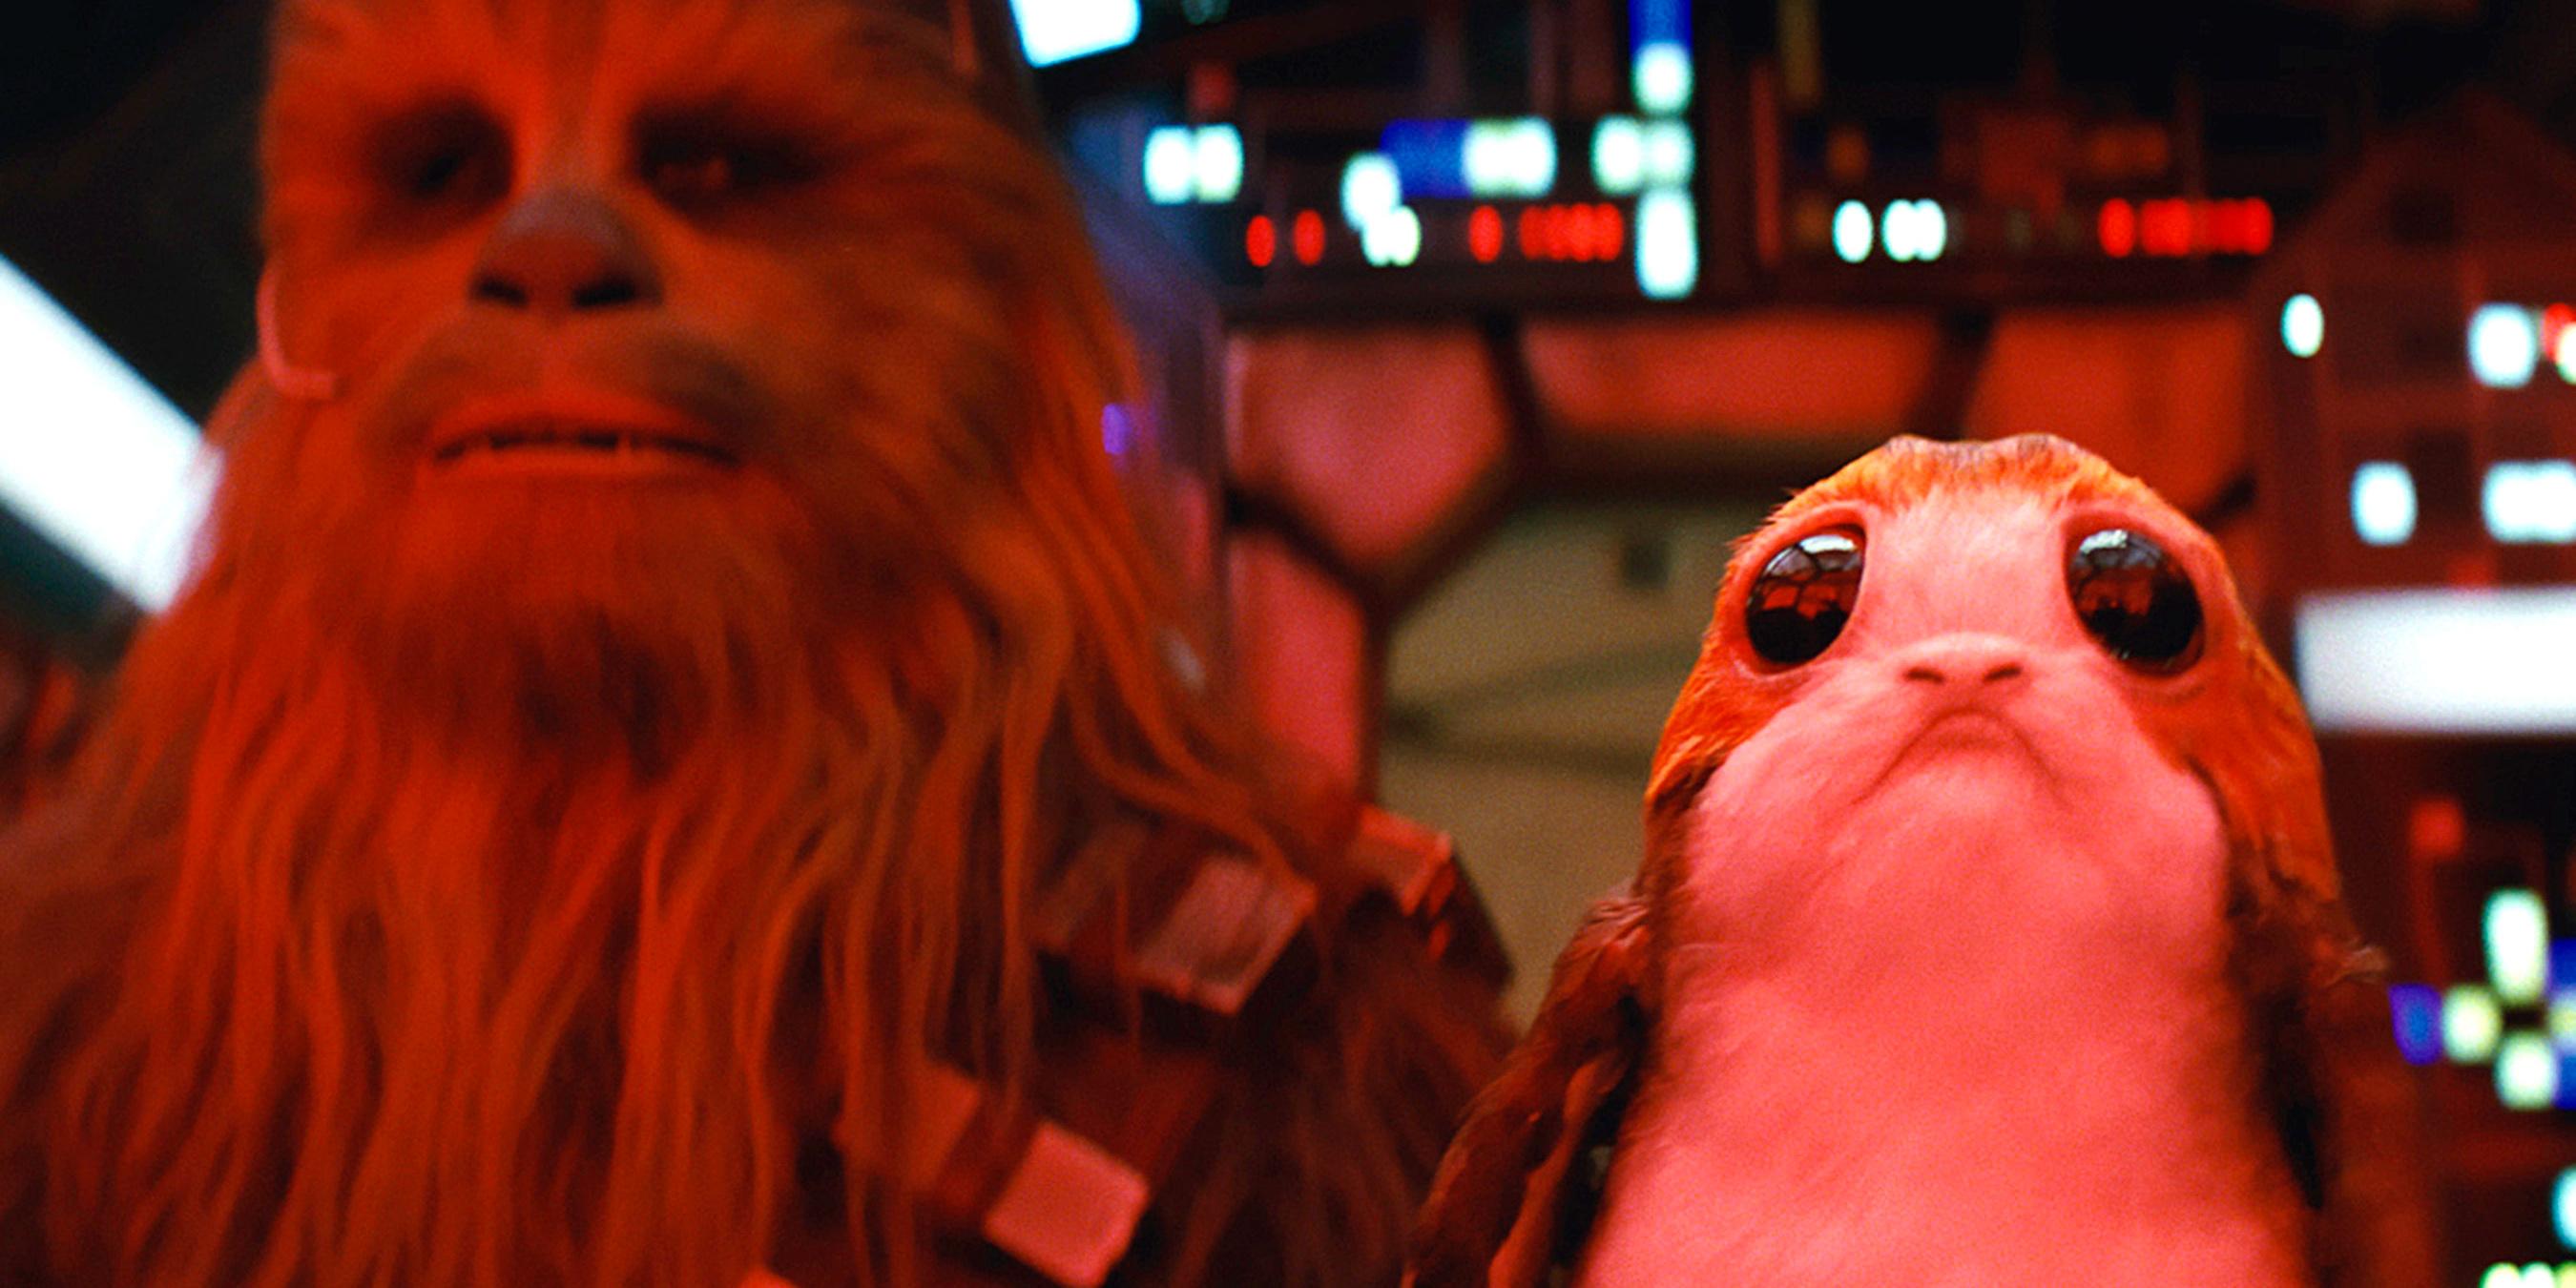 Chewbacca and a Porg in the Millennium Falcon in Star Wars The Last Jedi